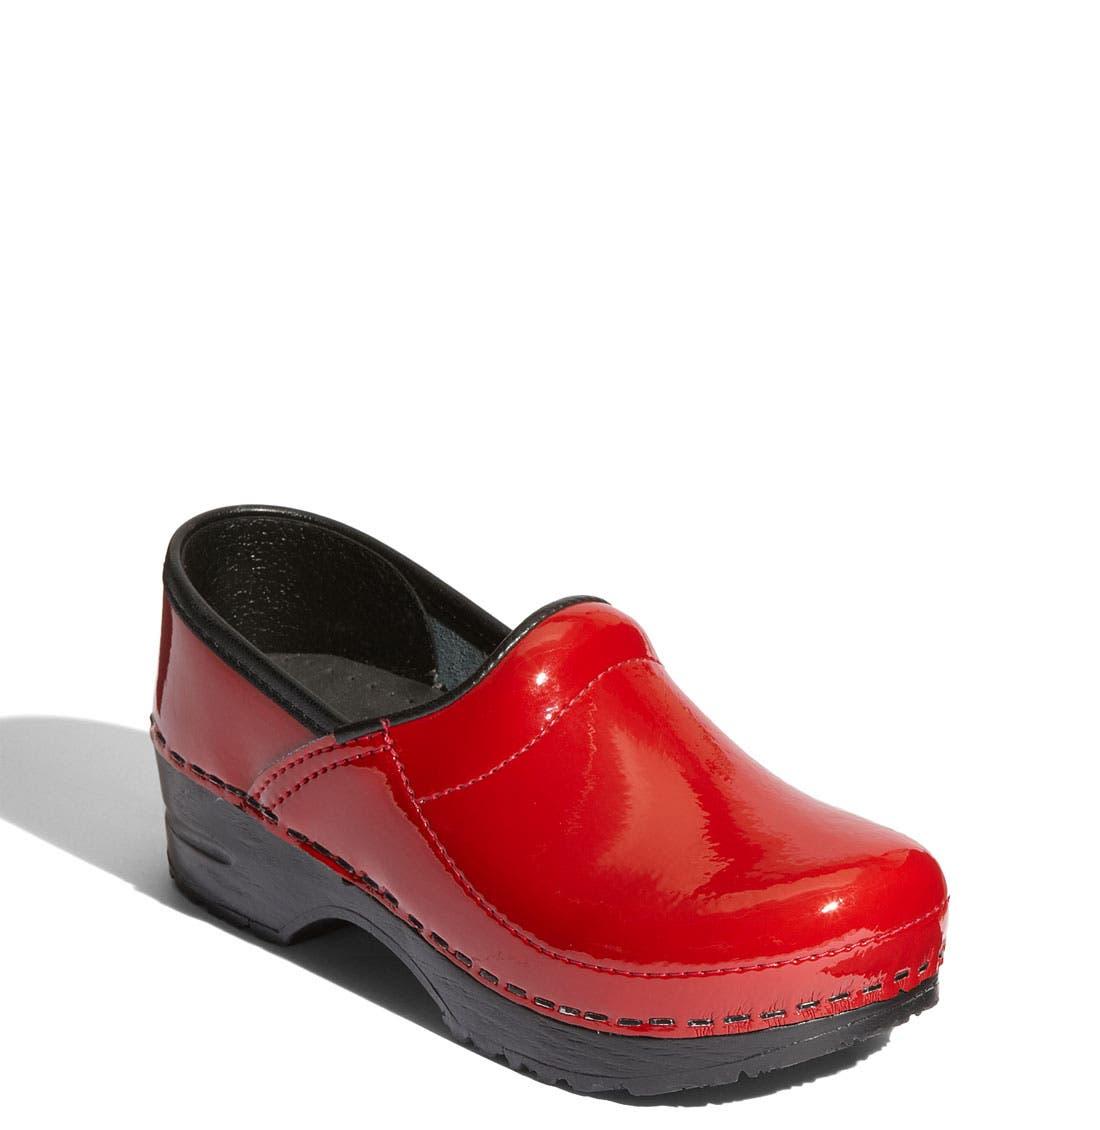 Alternate Image 1 Selected - Sanita 'Gitte' Patent Leather Clog (Toddler, Little Kid & Big Kid)